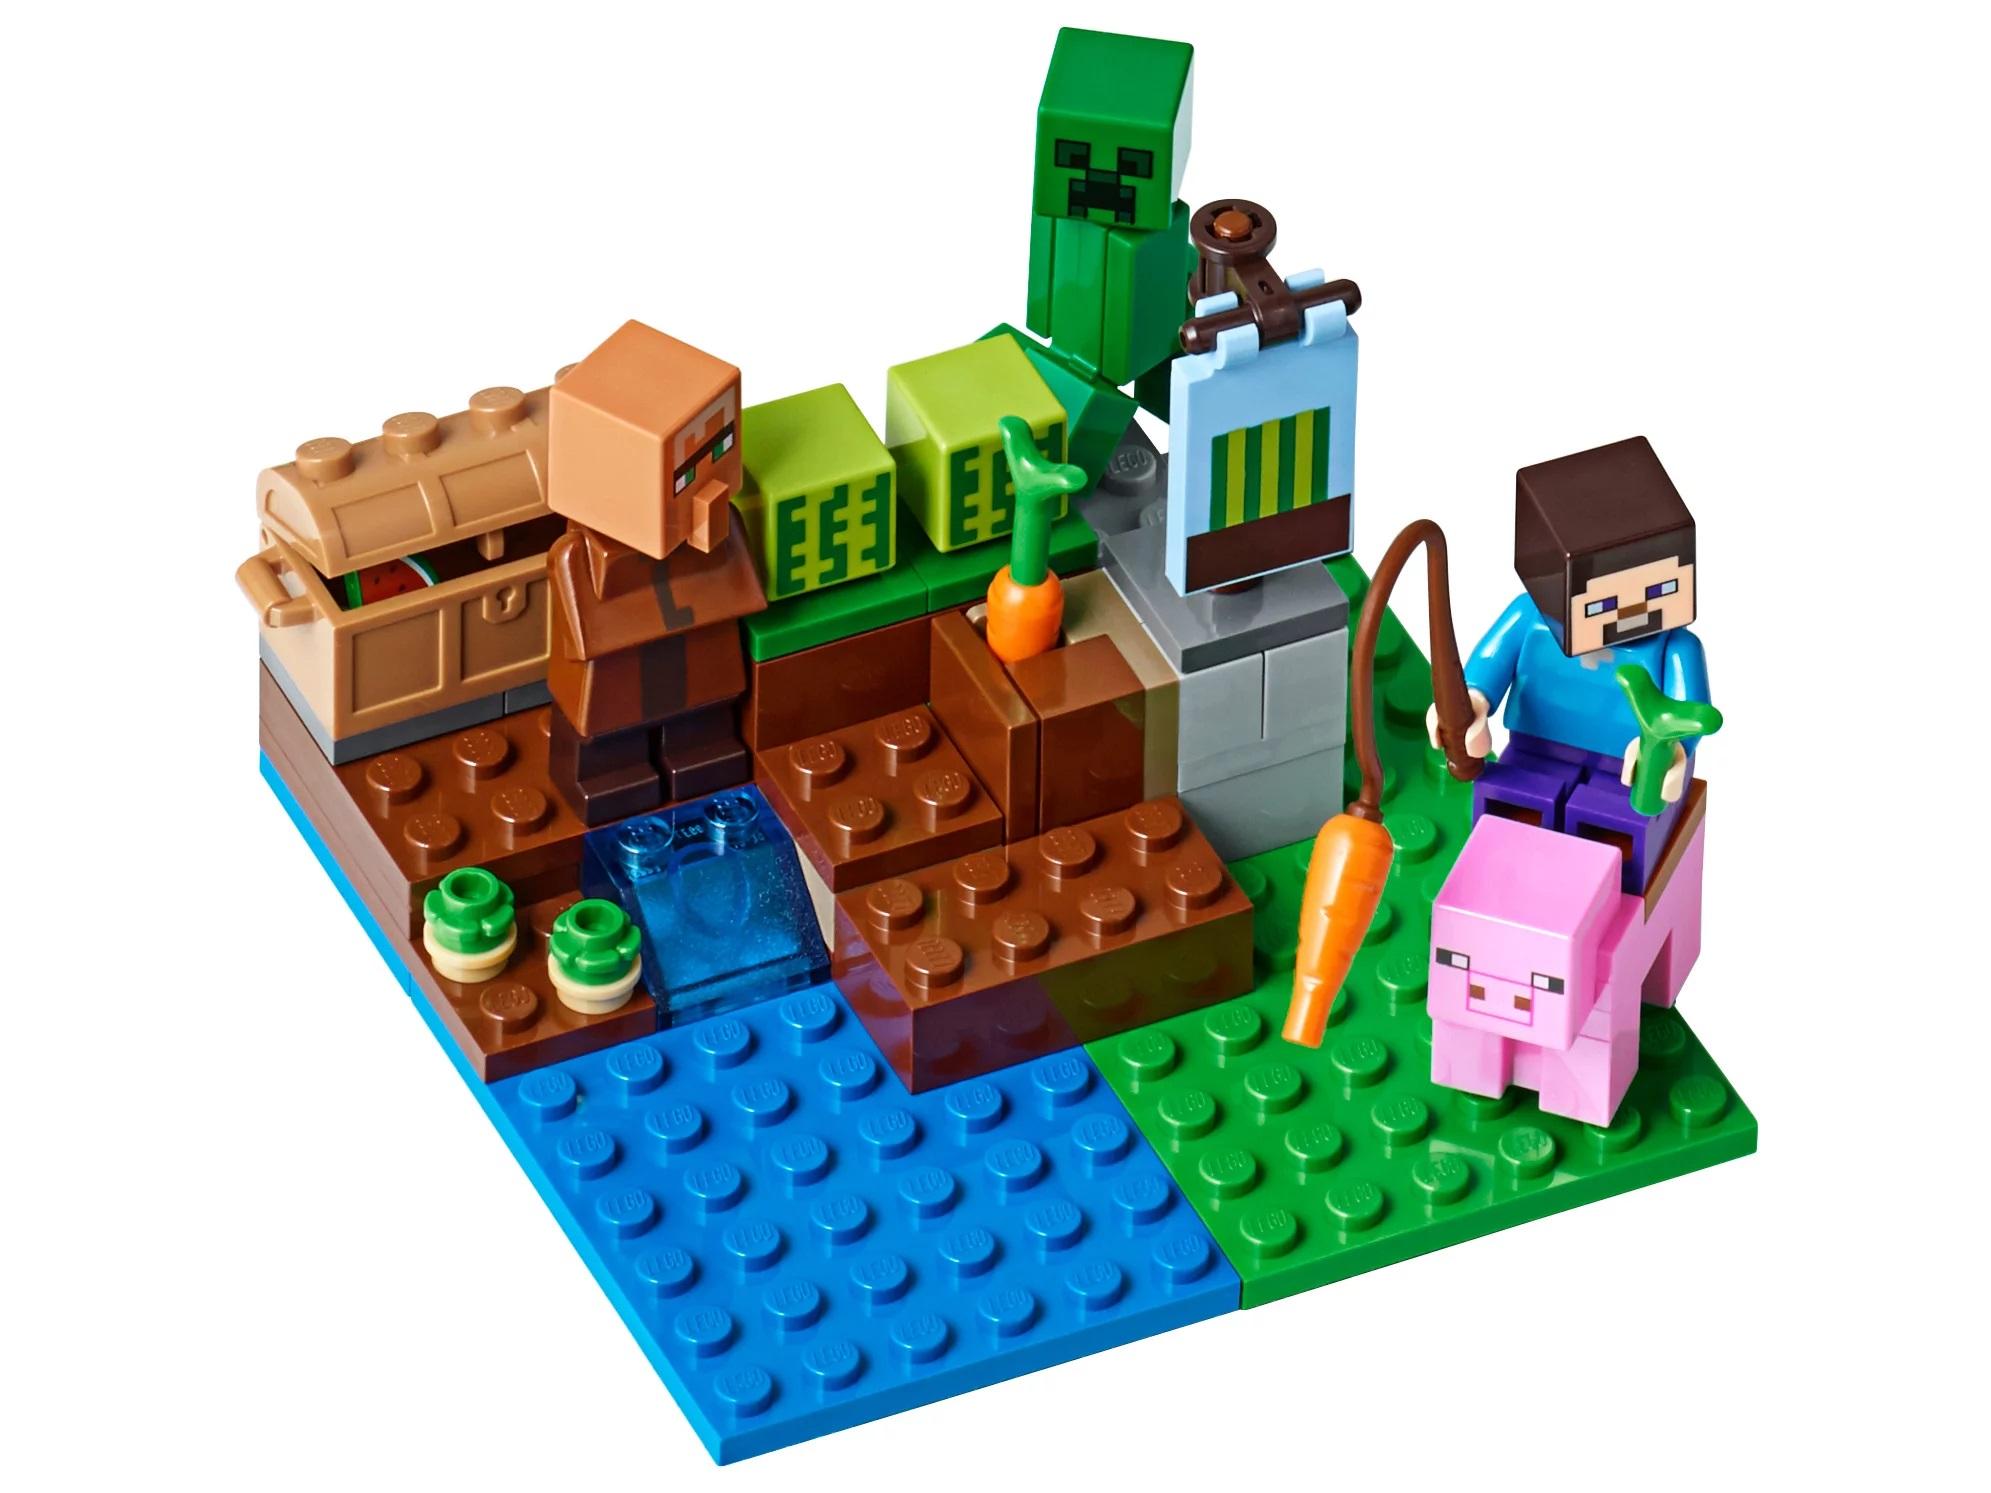 лего майнкрафт ферма купить в москве